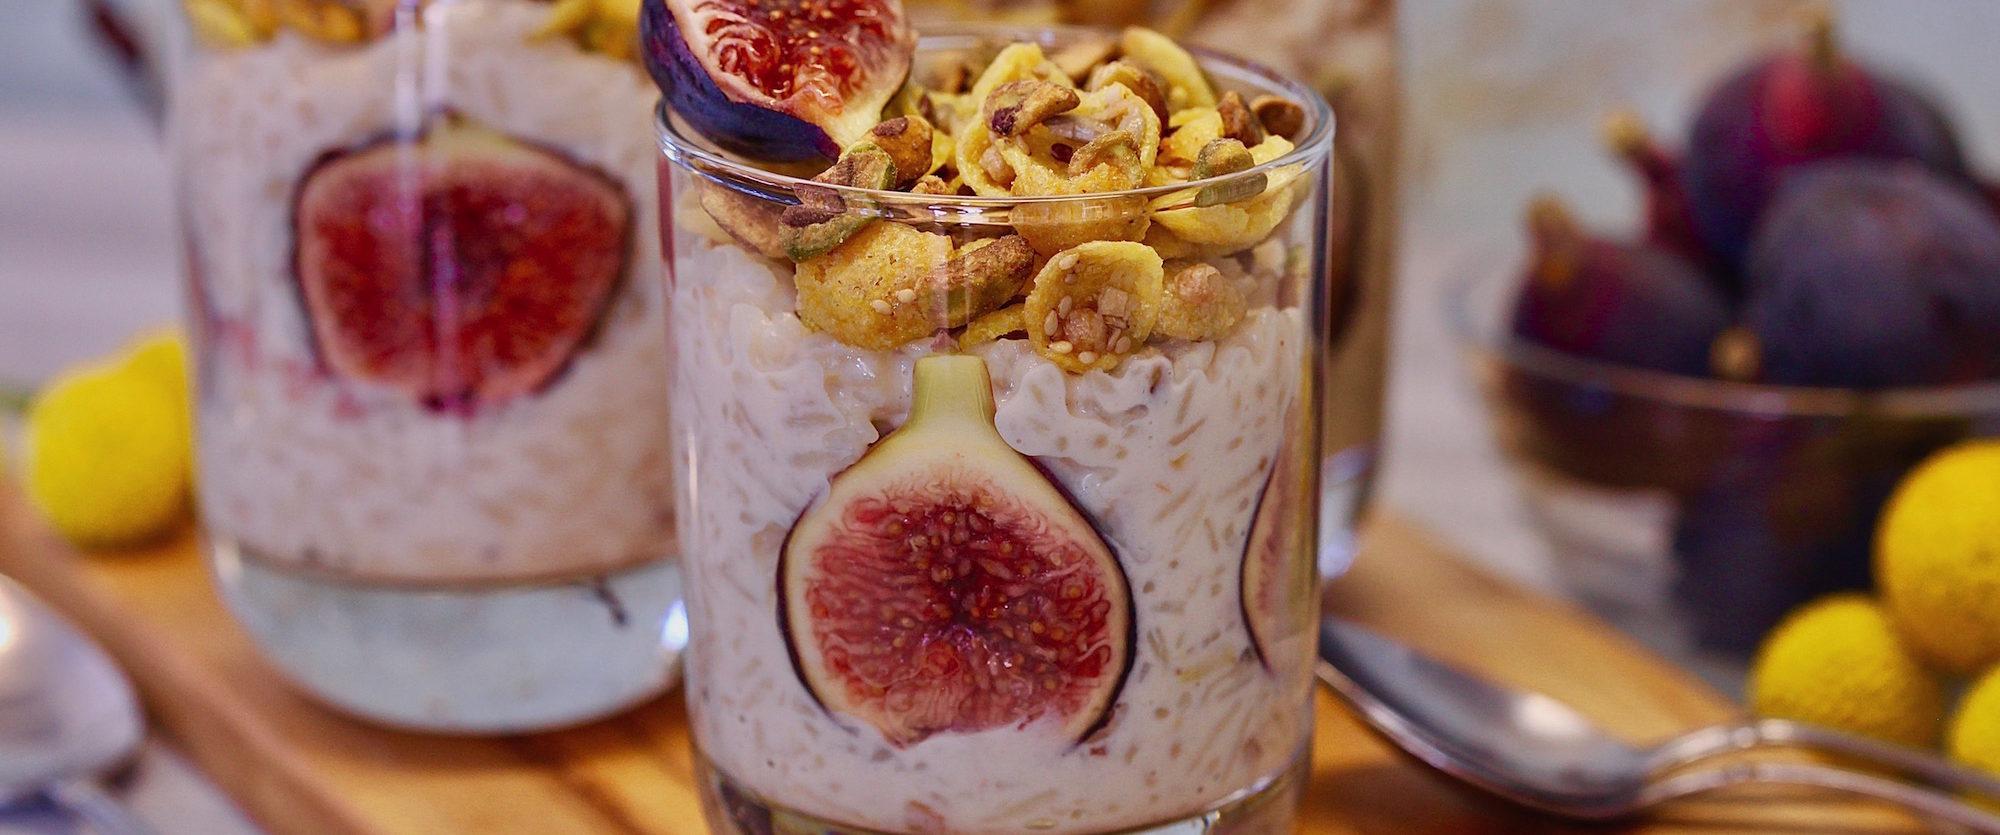 Pistachio Fig Arroz Con Leche: Gluten Free Dessert